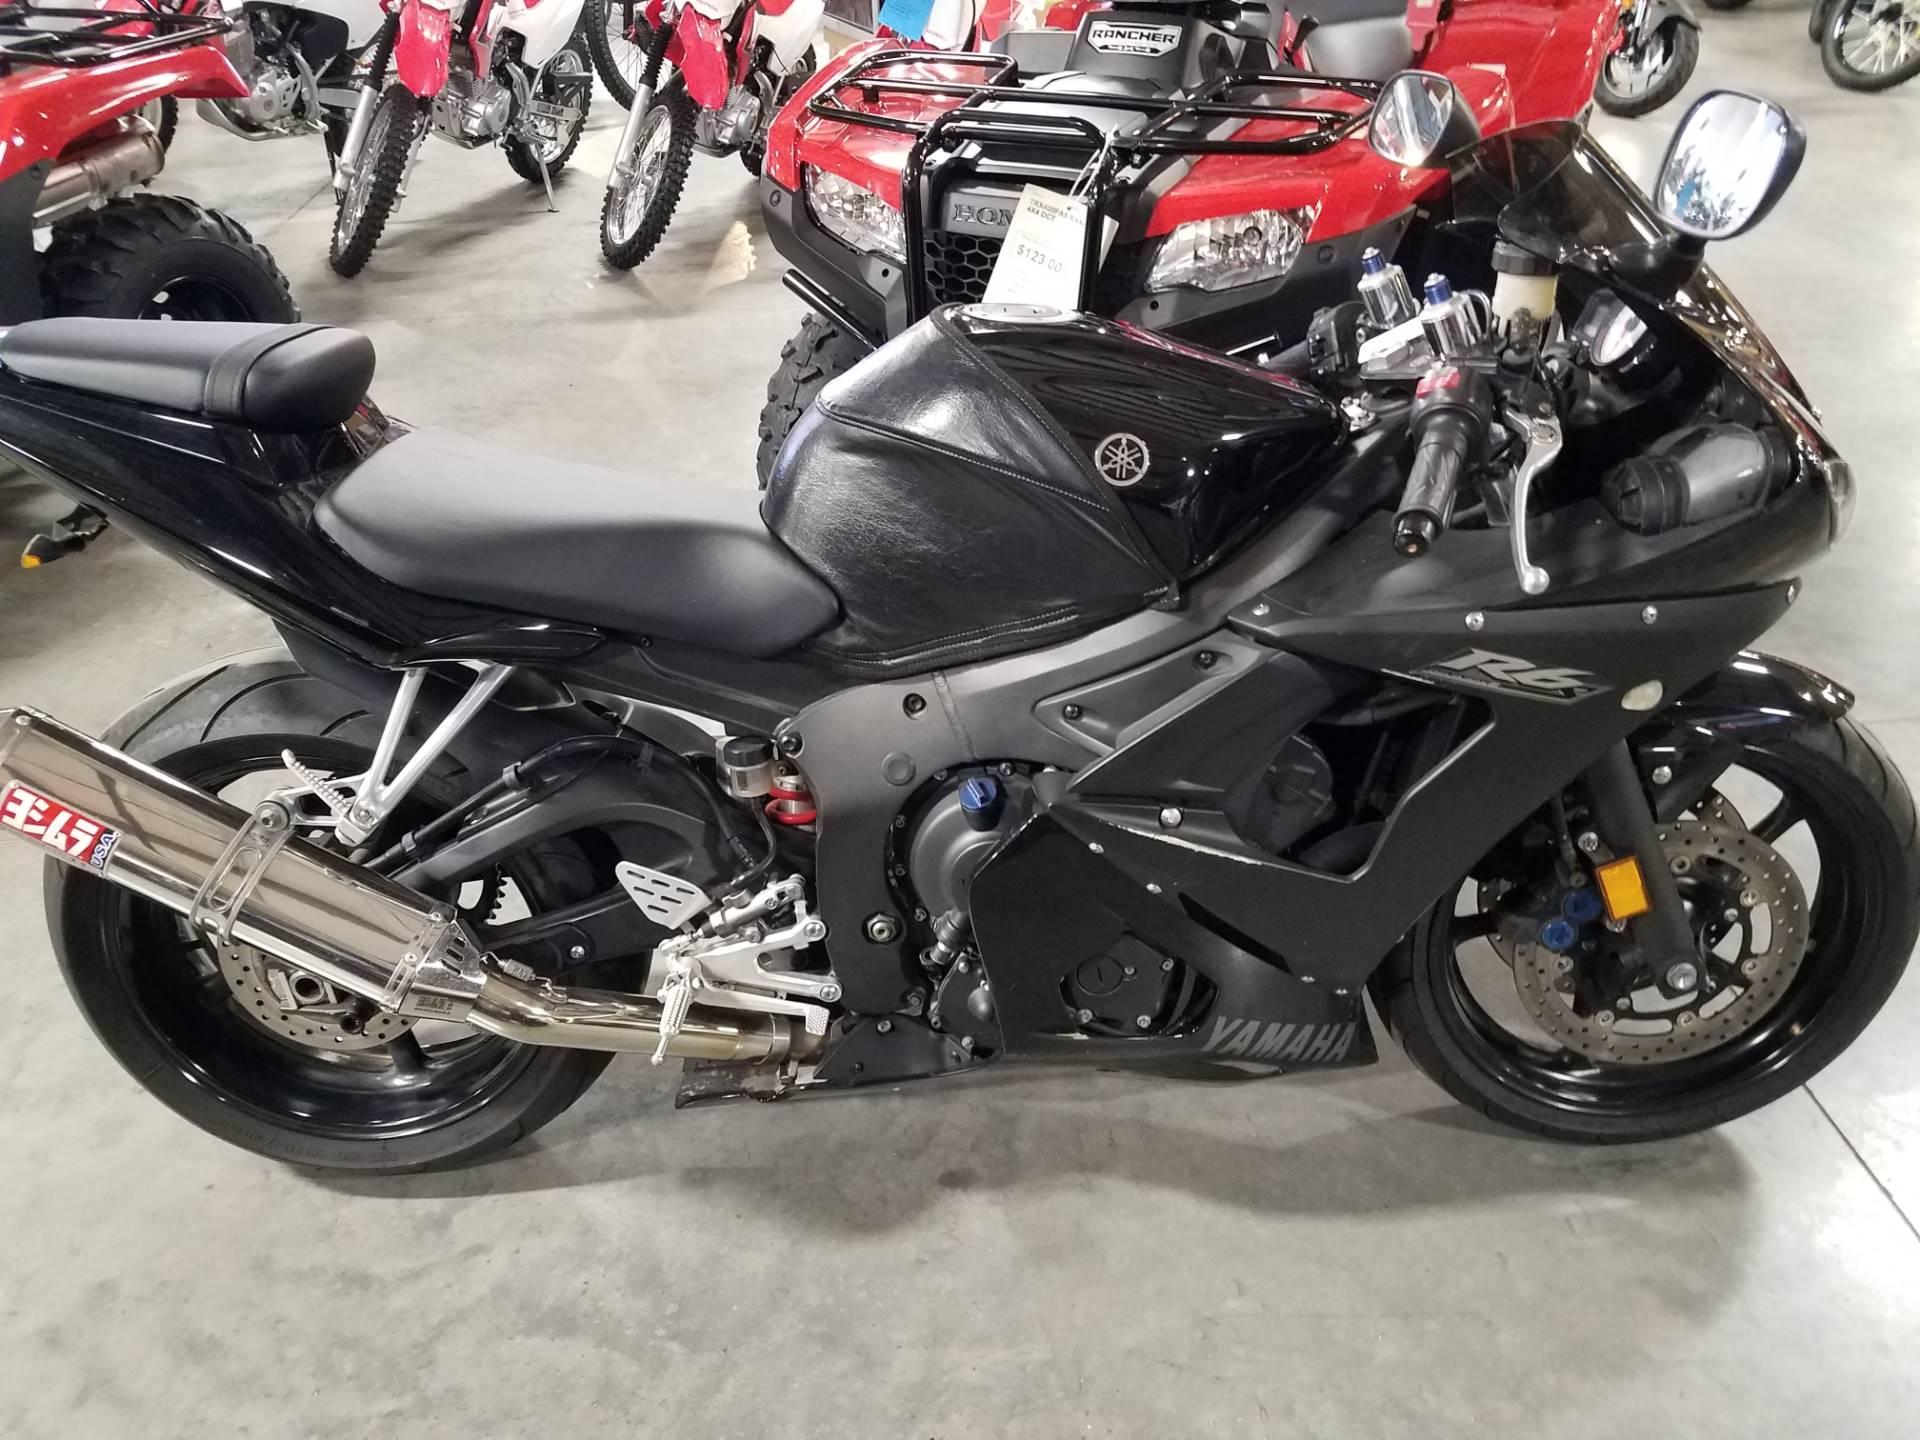 2008 Yamaha R6S for sale 94173